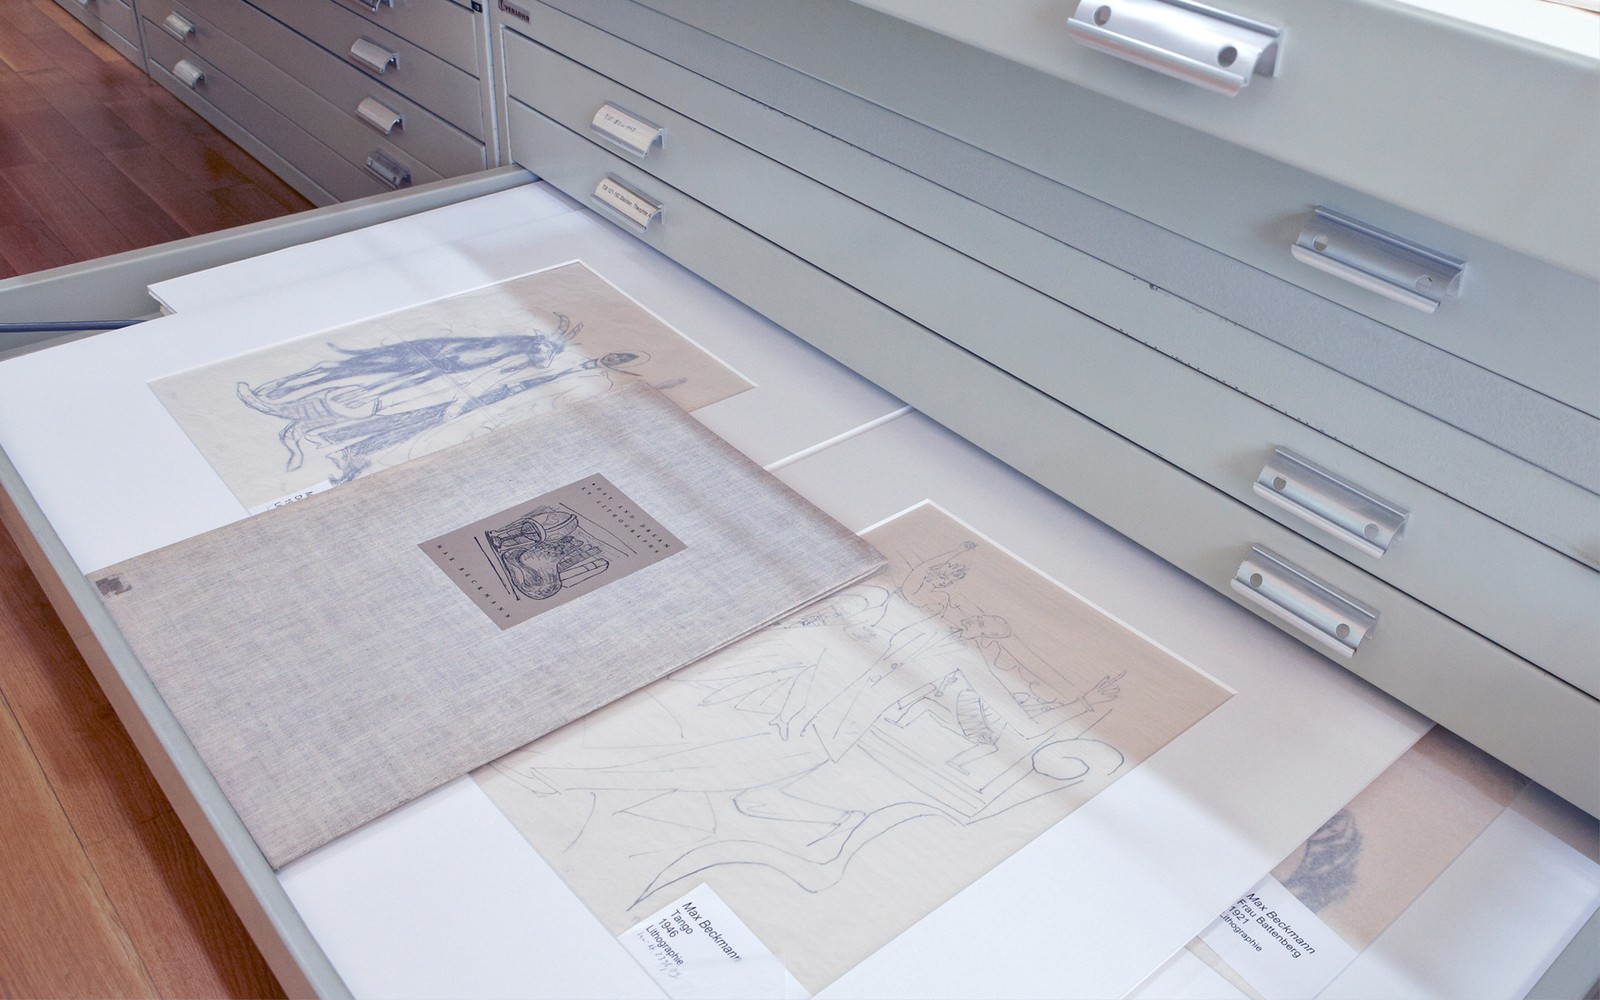 10 Blick in die grafische Sammlung des Kunstmuseums